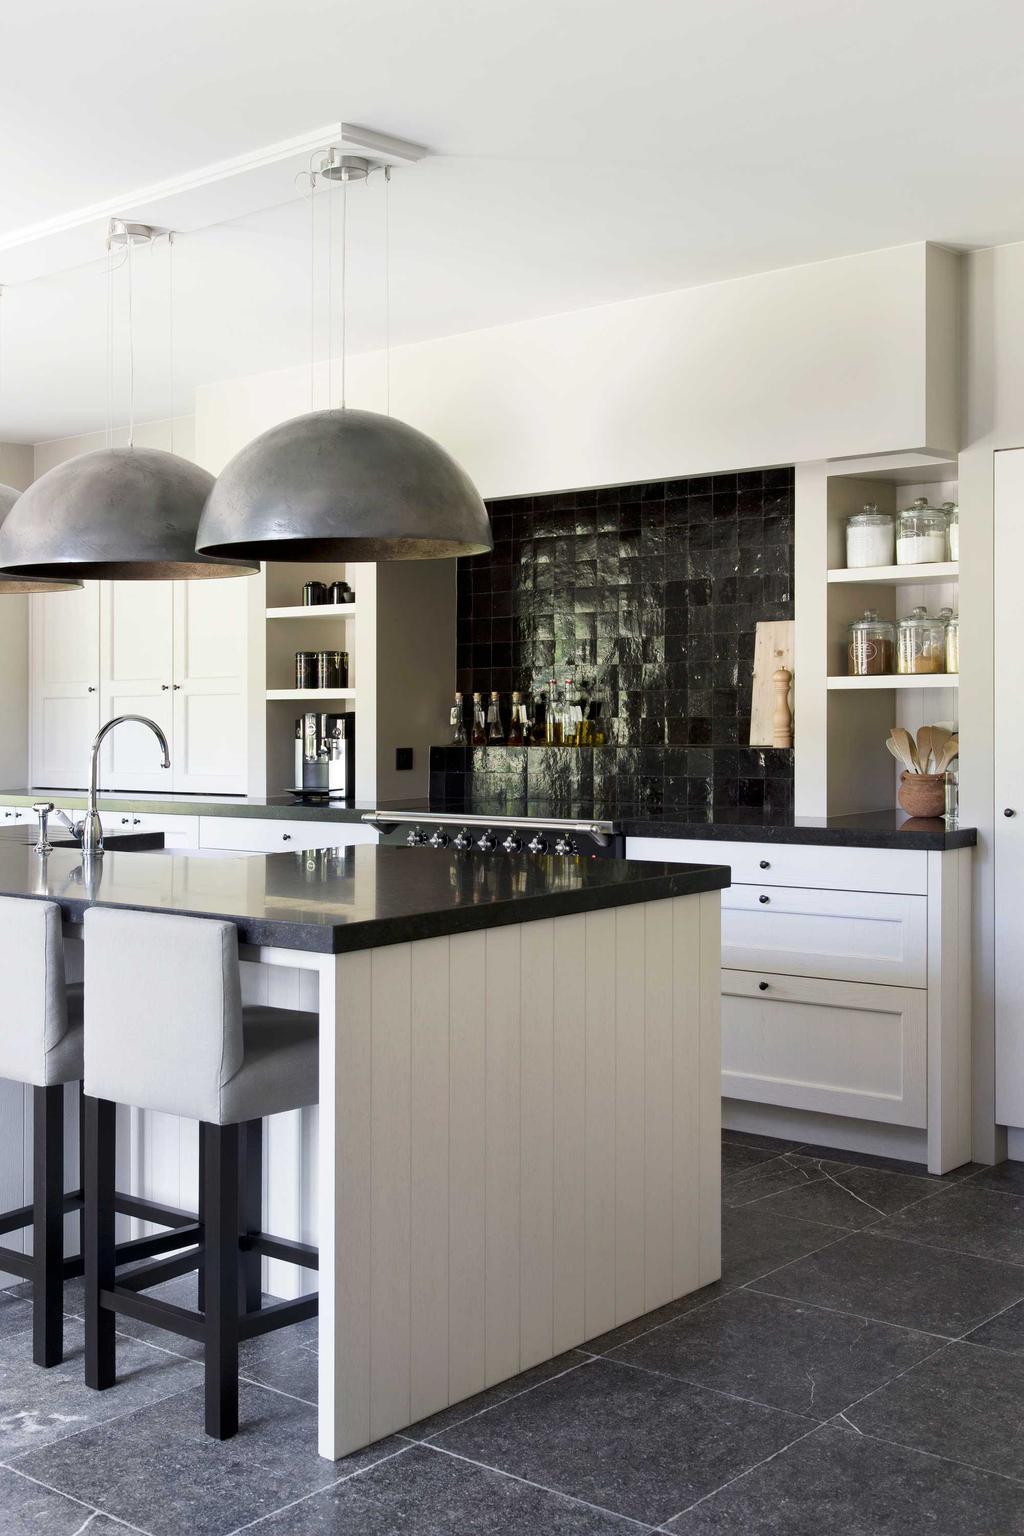 keukeneiland zwart wit